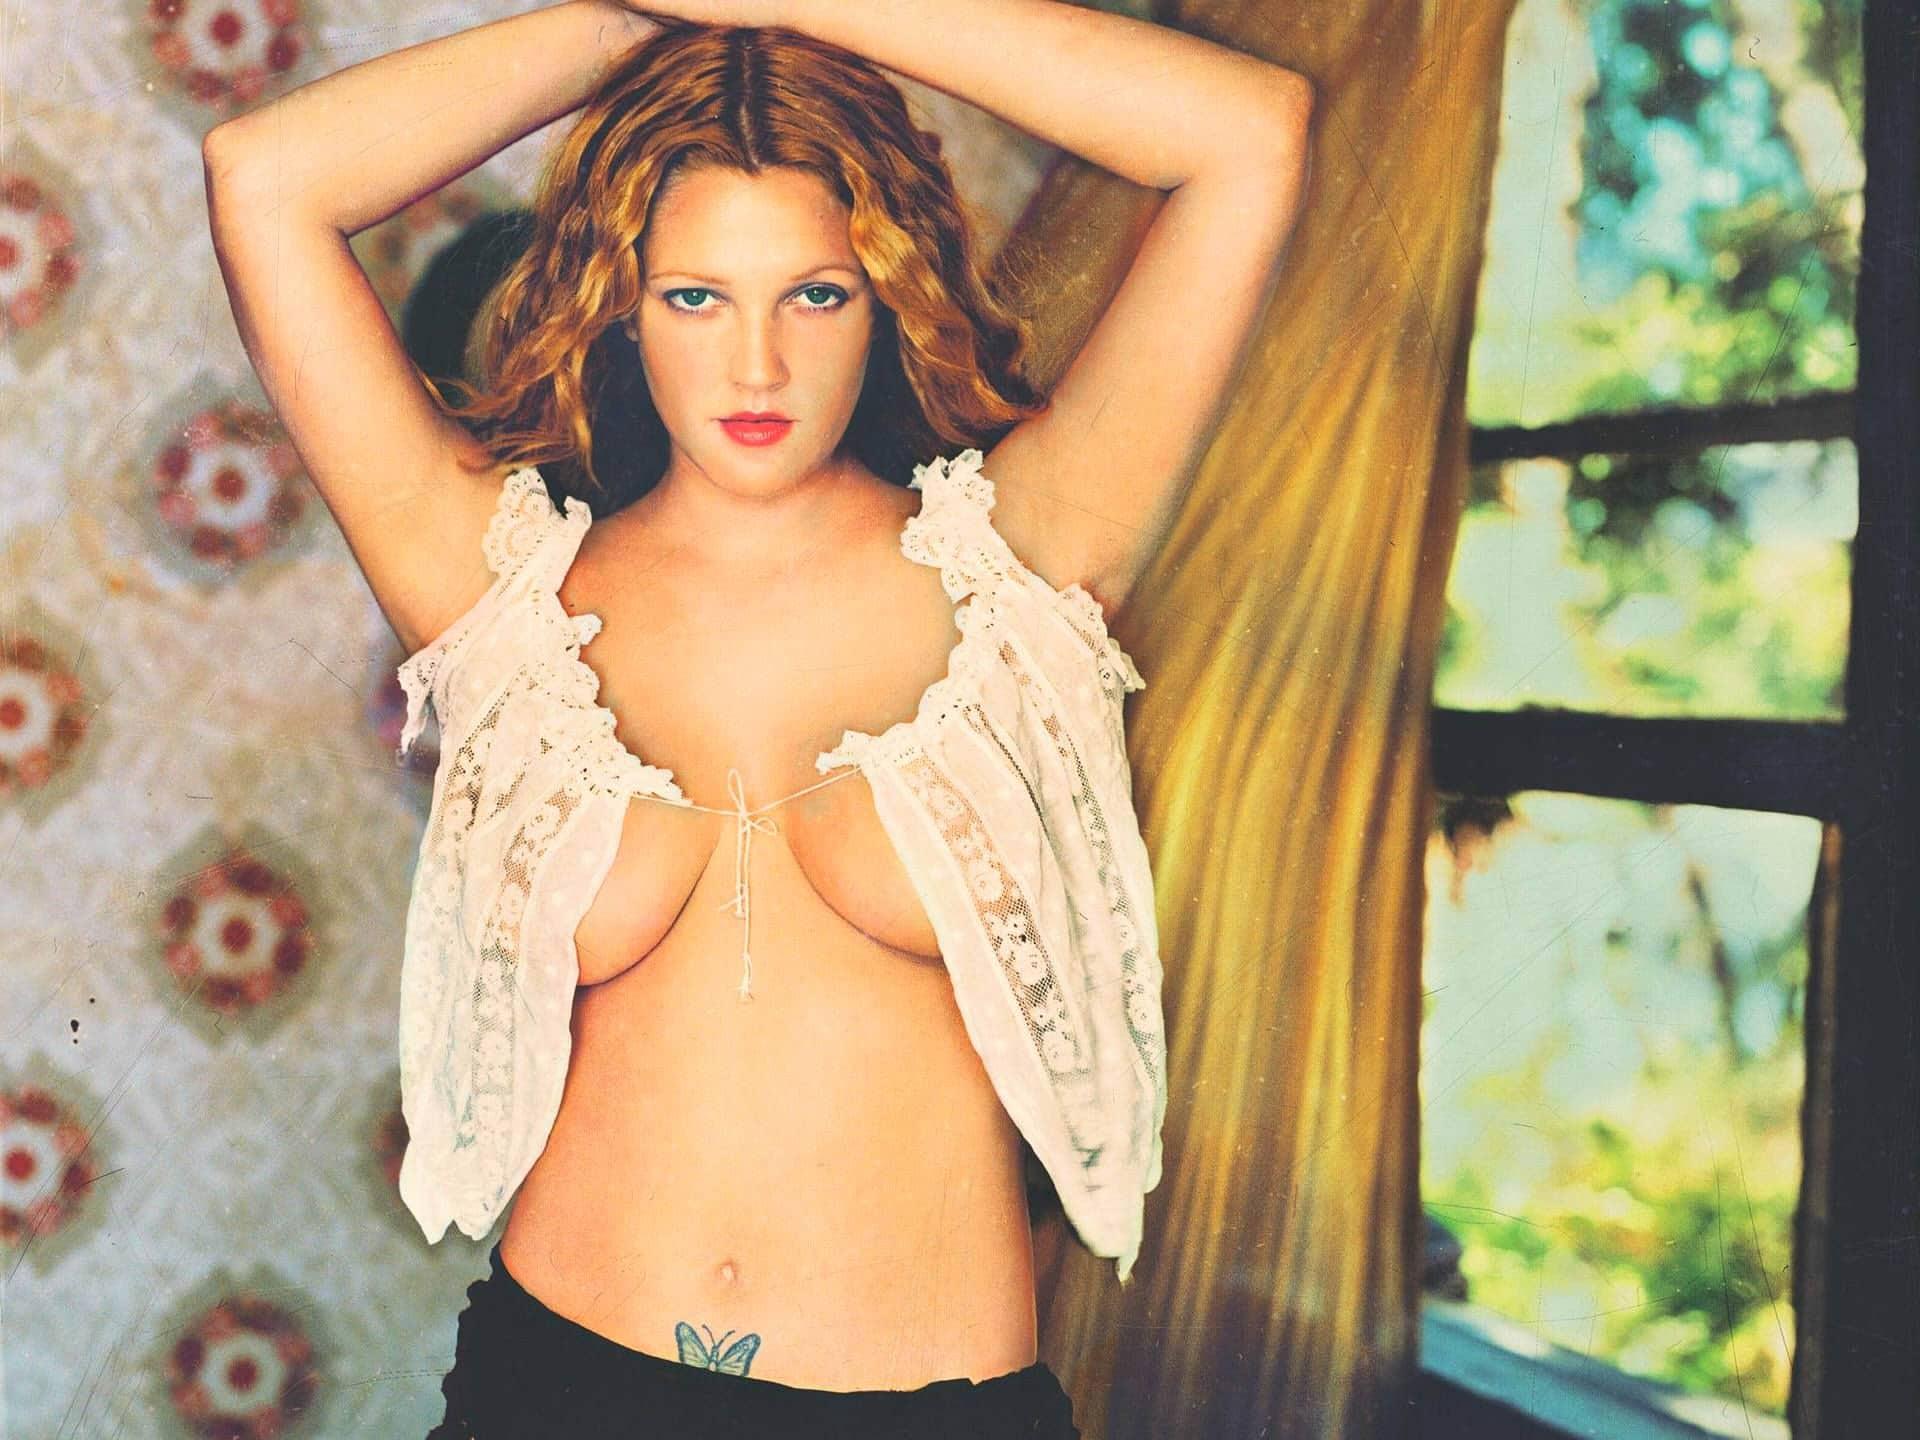 Nude photos drew barrymore